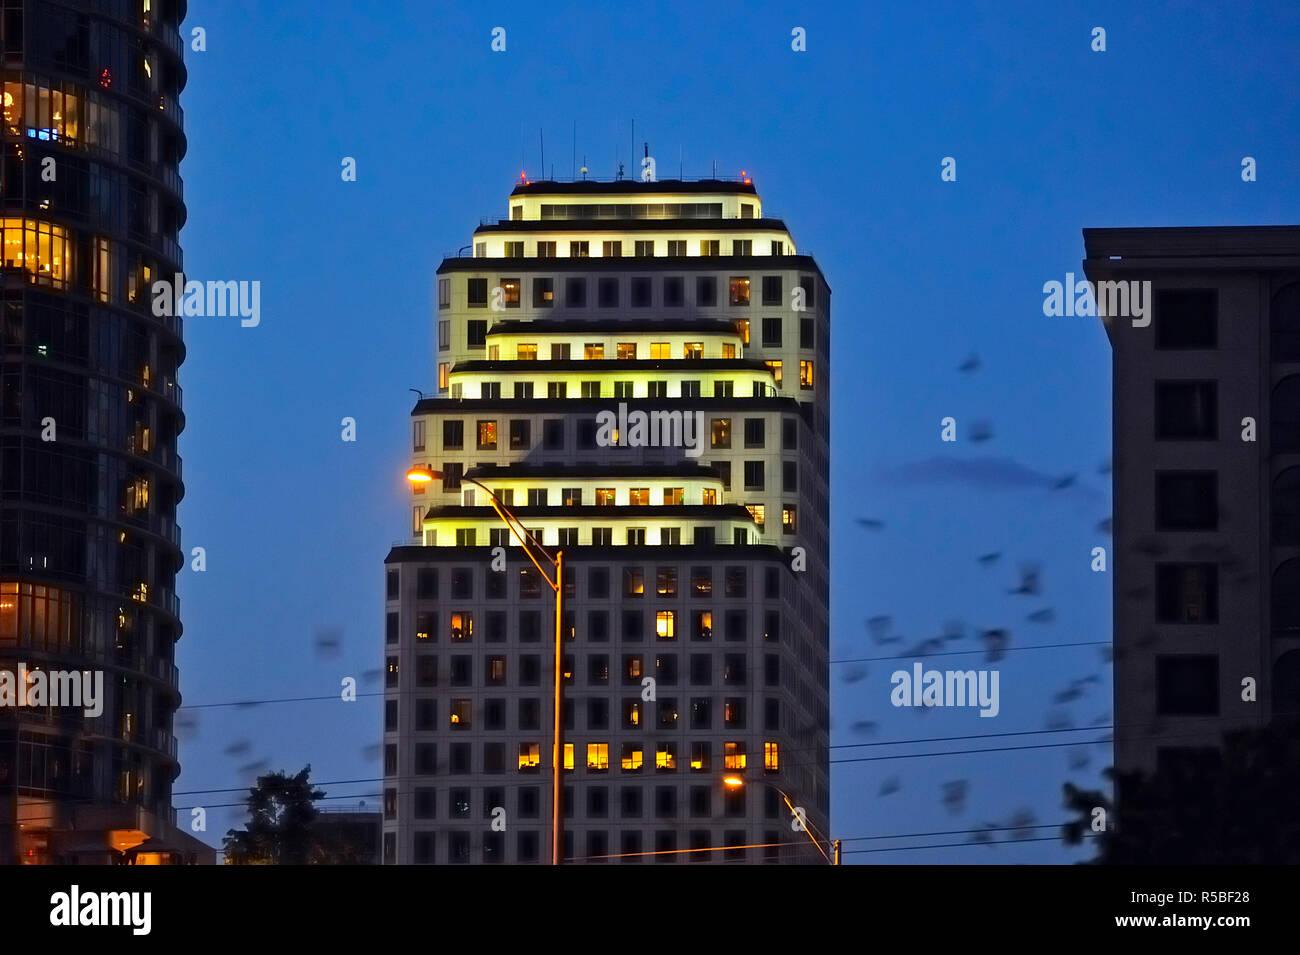 Austin high rise buildings and flocks of emerging bats, Austin, Texas, USA - Stock Image